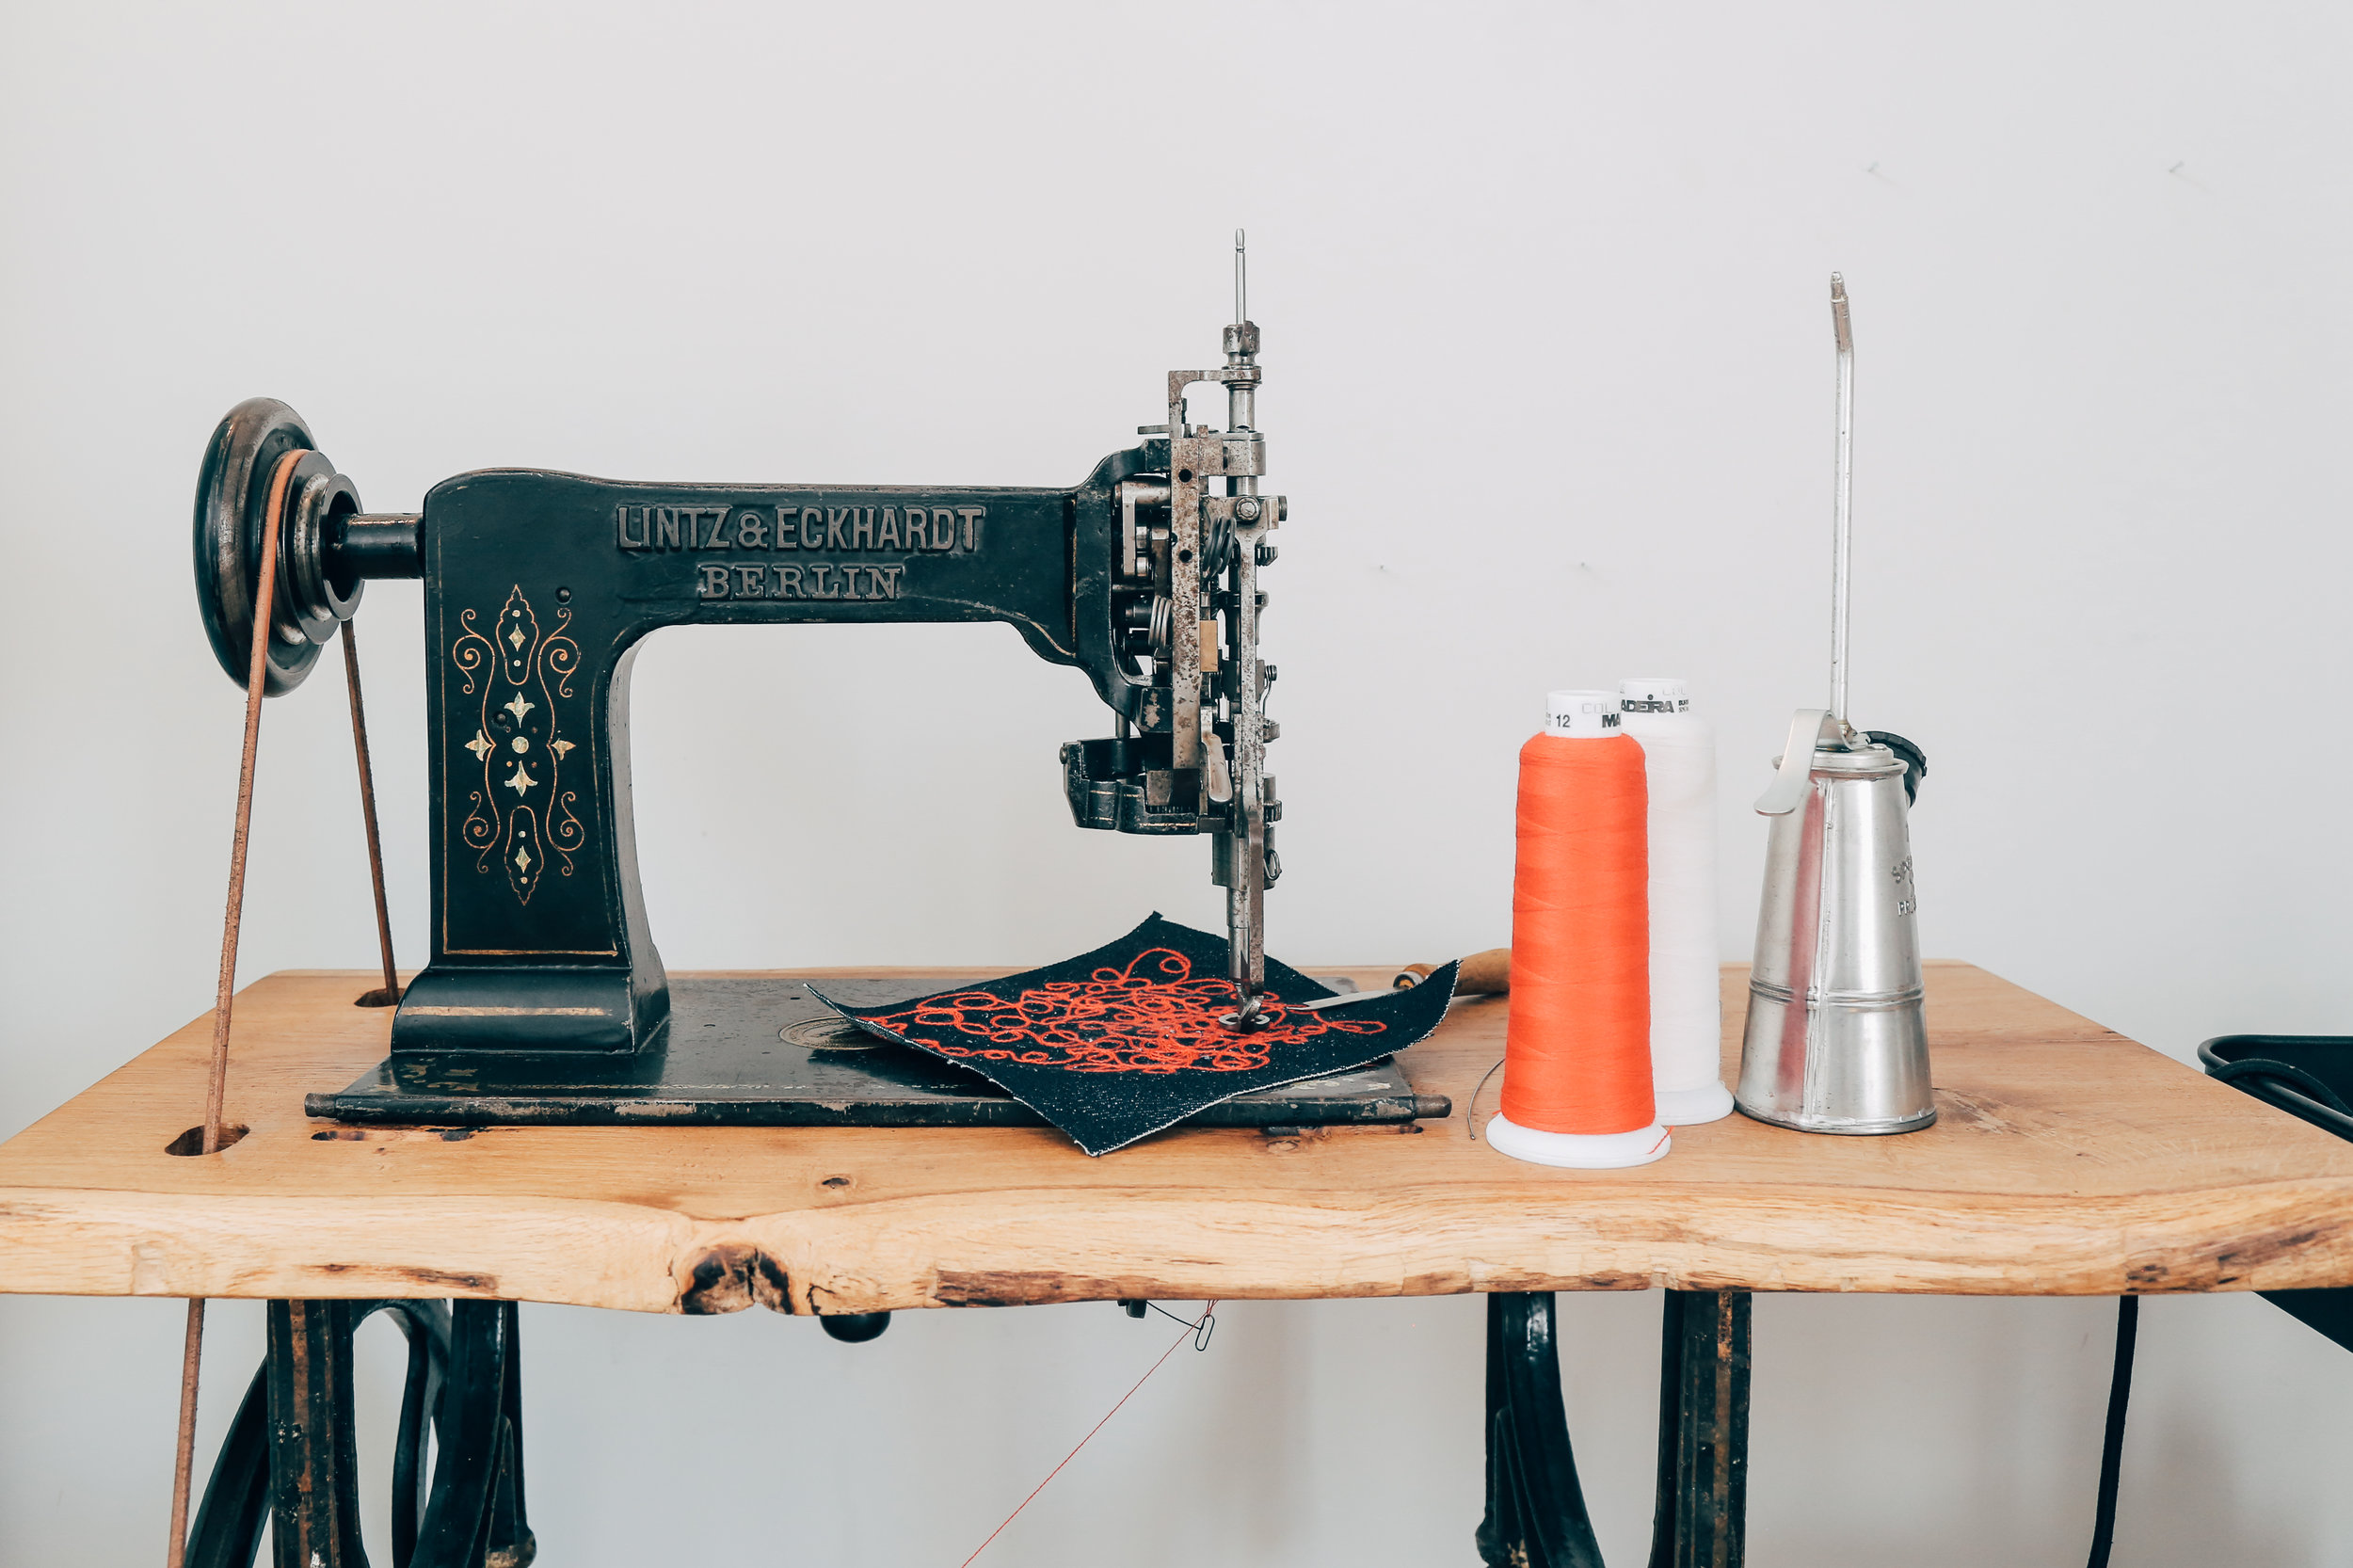 Lintz & Eckhardt 11 Cornely K vintage chainstitch embroidery machine 12